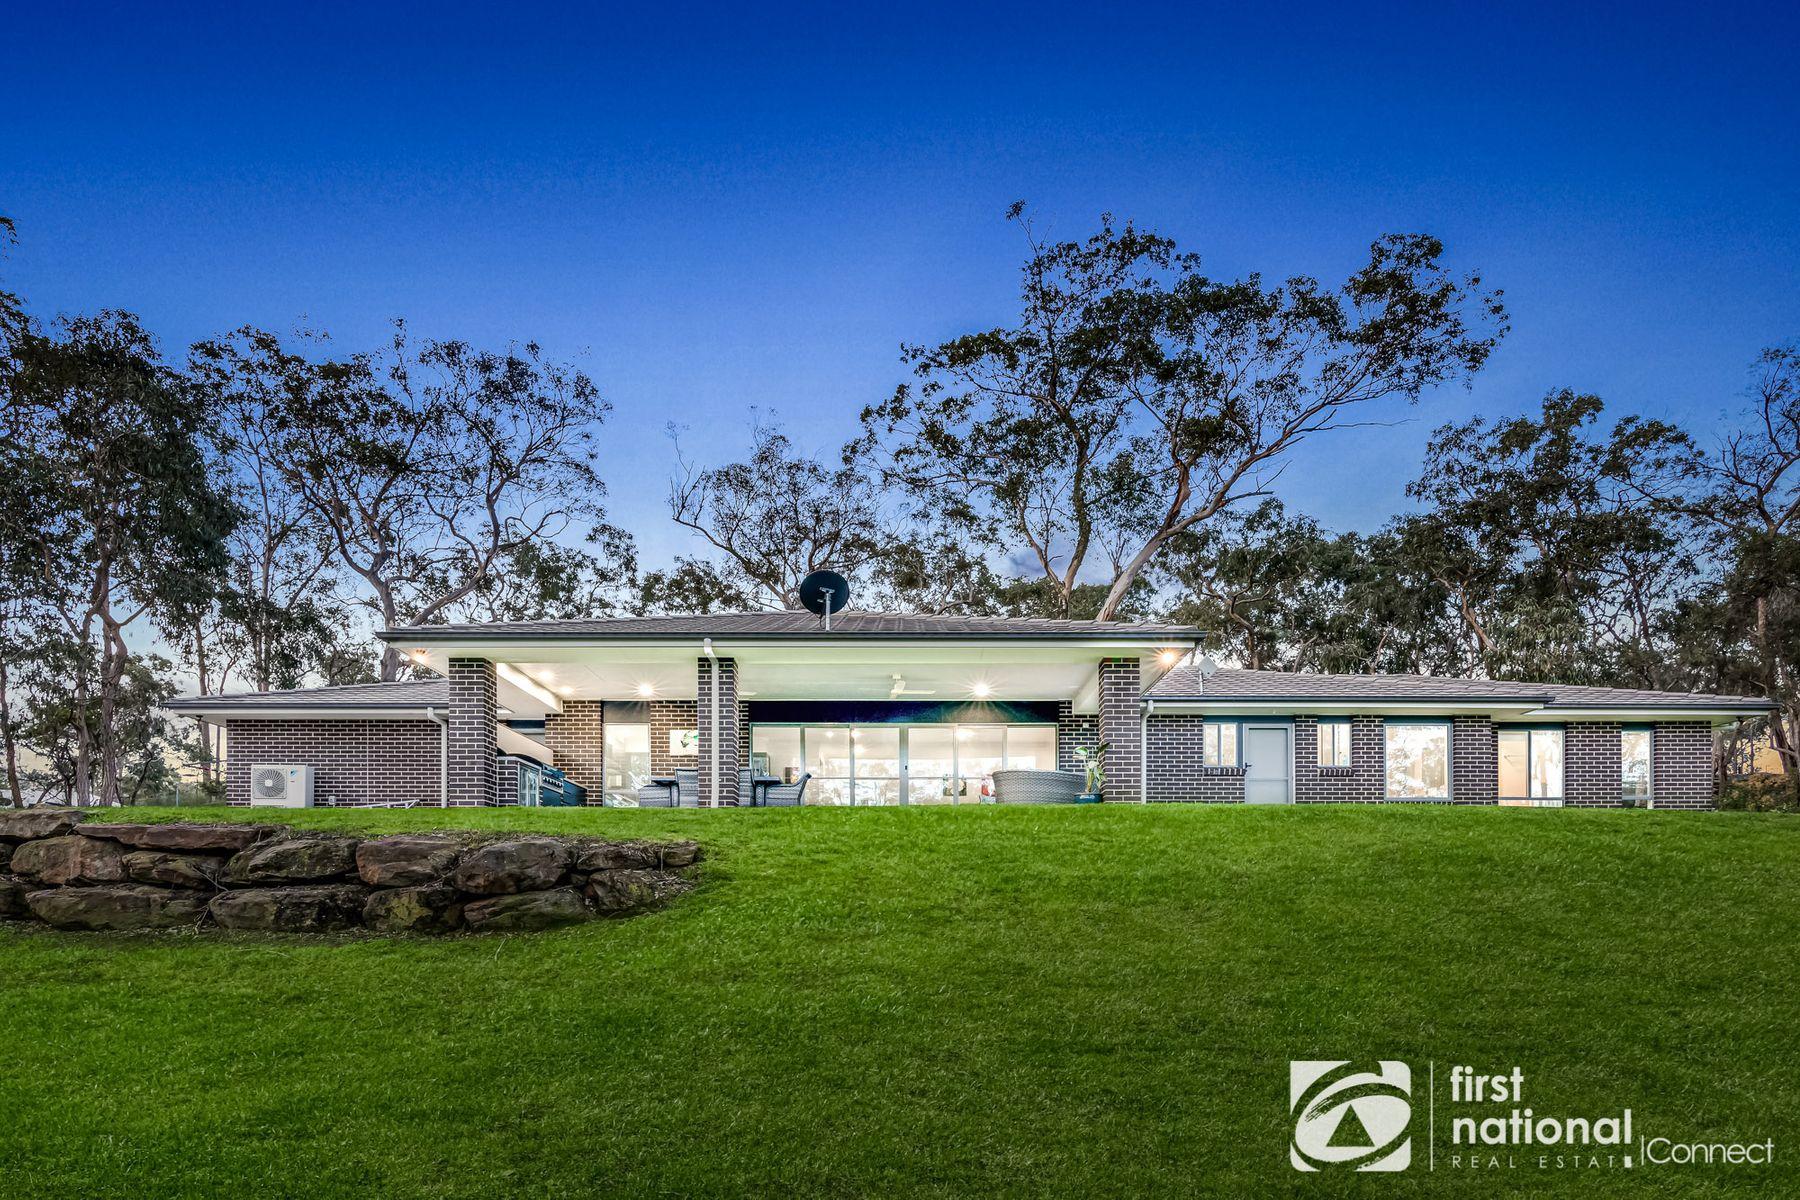 108 Royerdale Place, East Kurrajong, NSW 2758